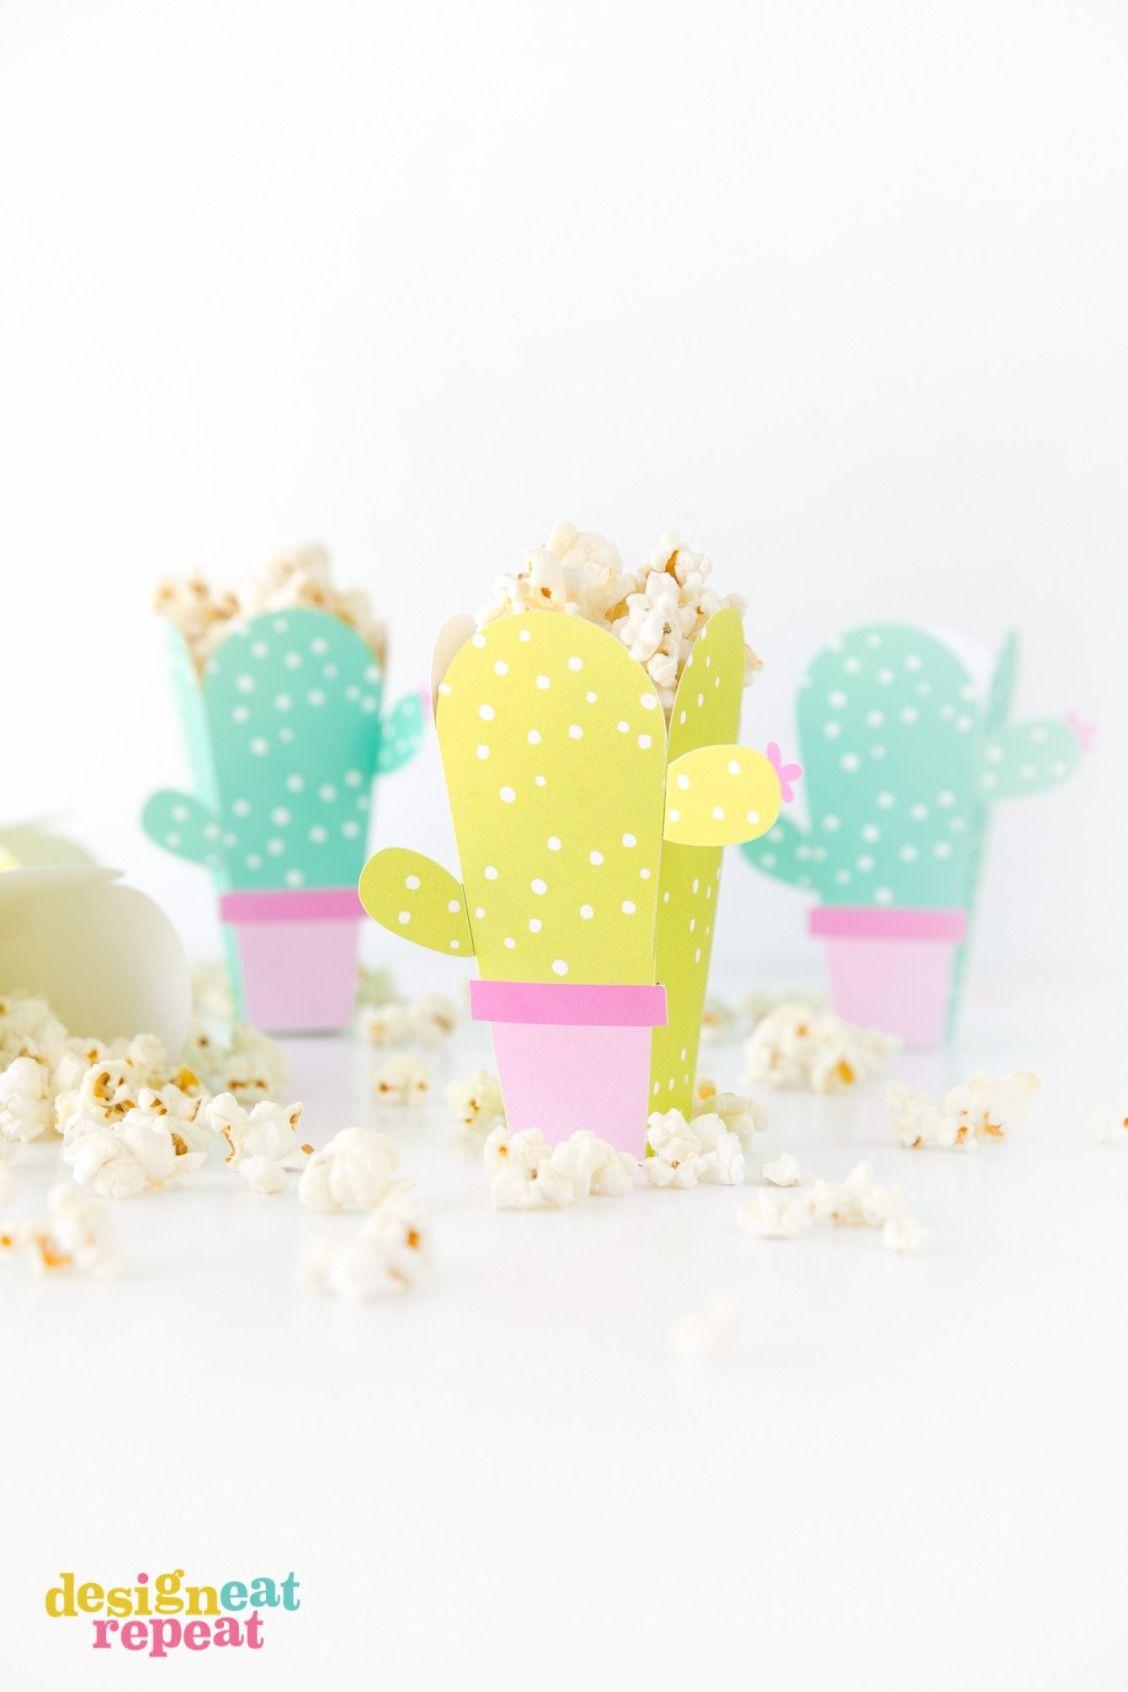 Popcorn template pdf